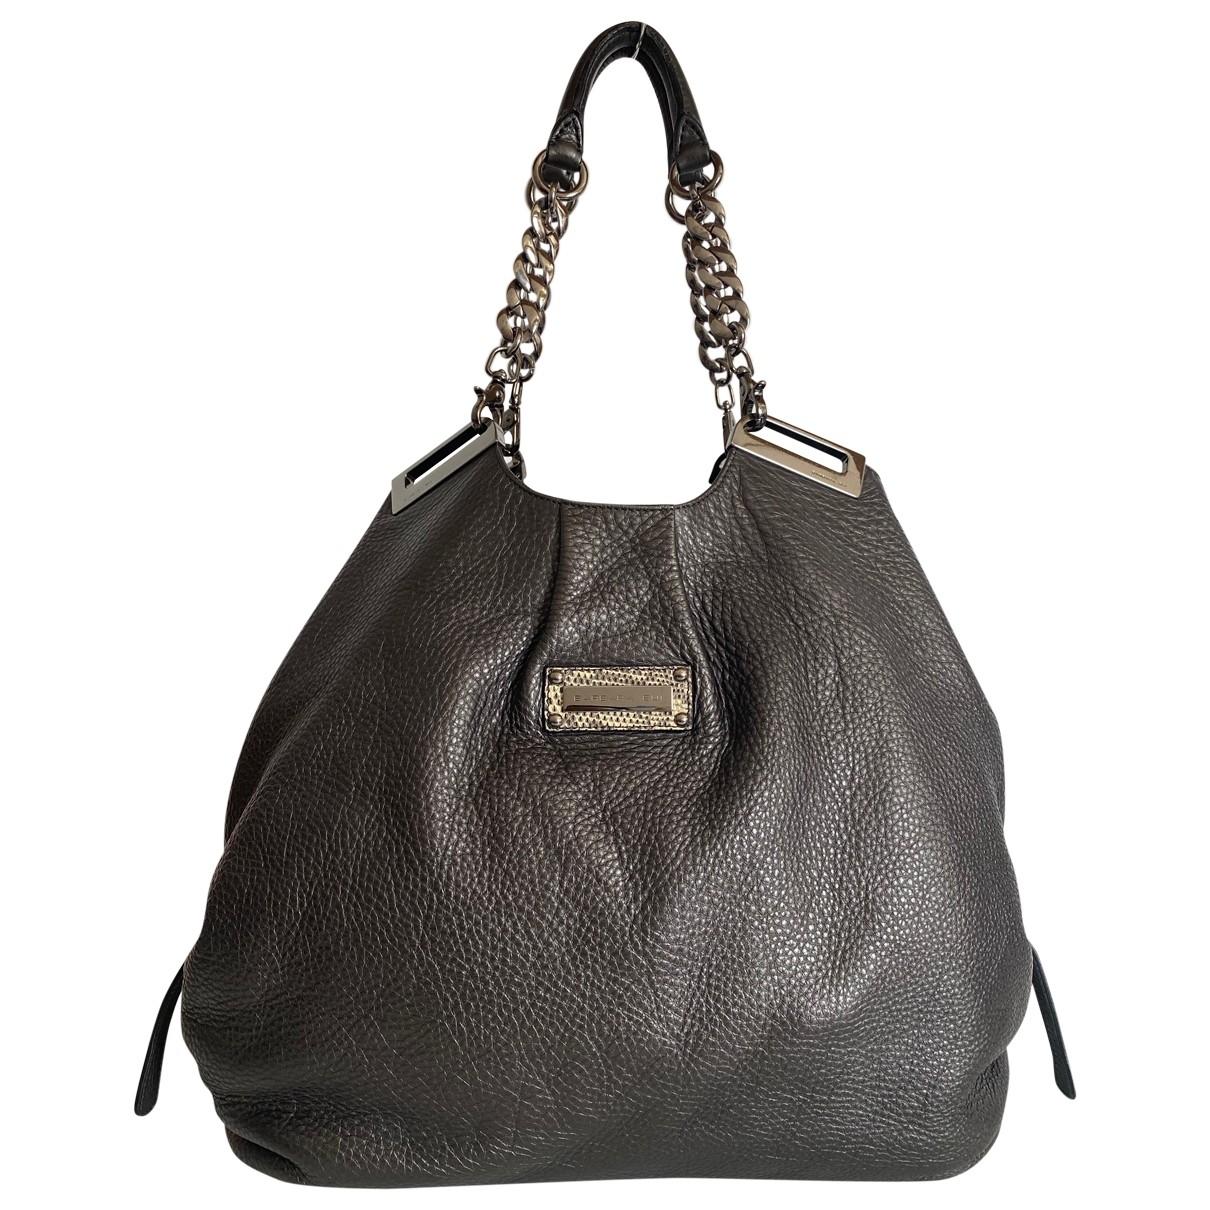 Barbara Bui \N Handtasche in  Schwarz Leder